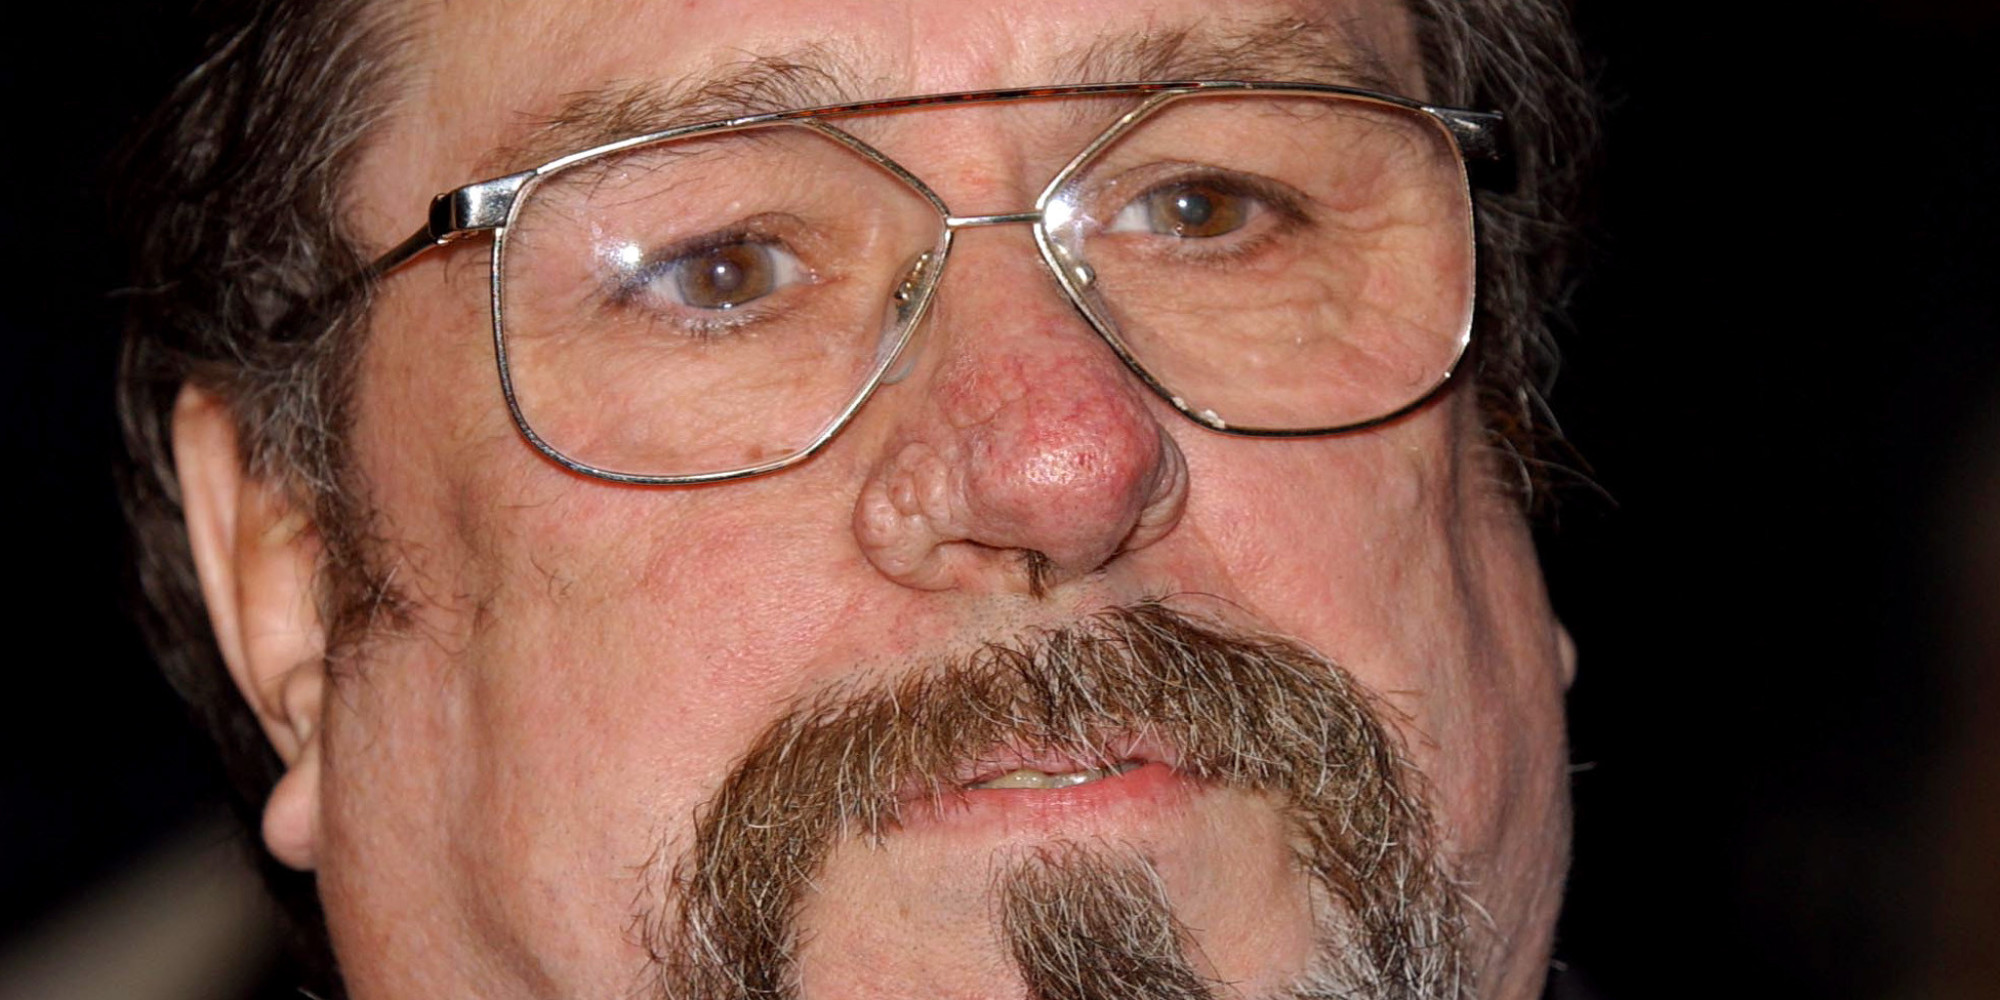 ricky tomlinson imdb